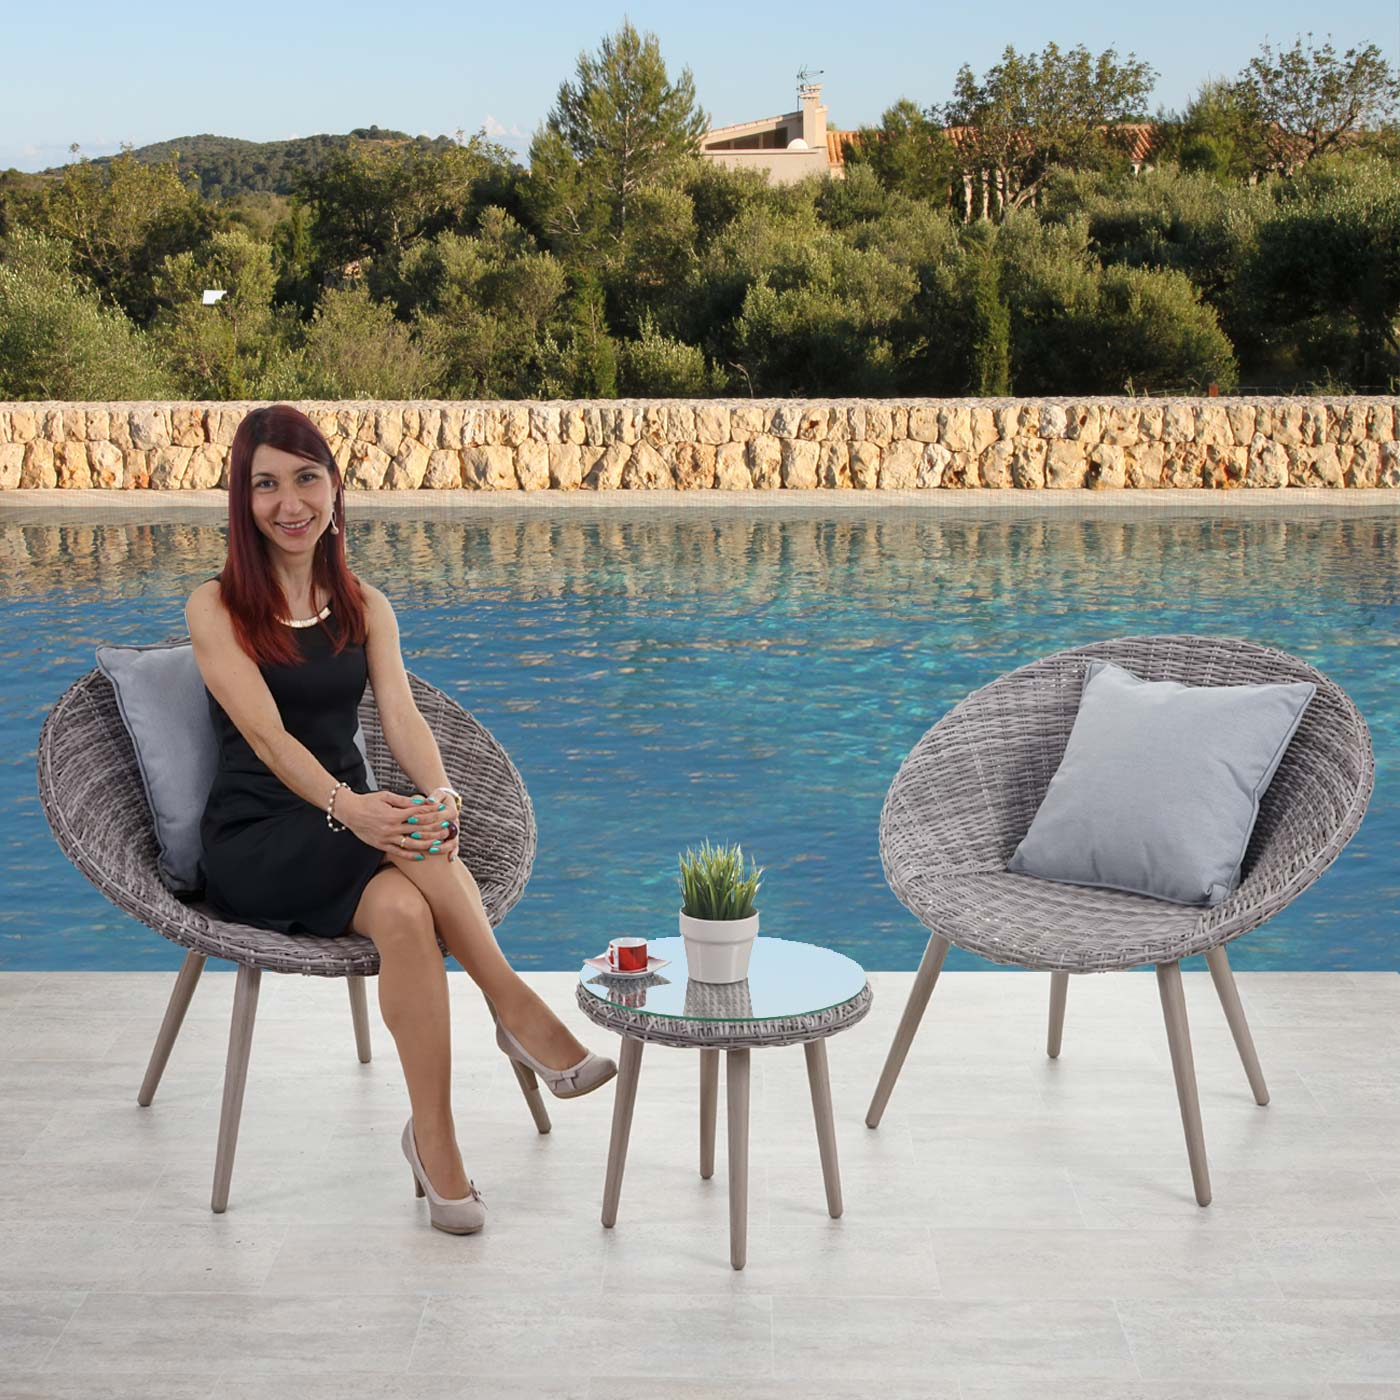 luxus poly rattan garnitur madrid premium lounge set gartengarnitur alu gestell naturgrau. Black Bedroom Furniture Sets. Home Design Ideas